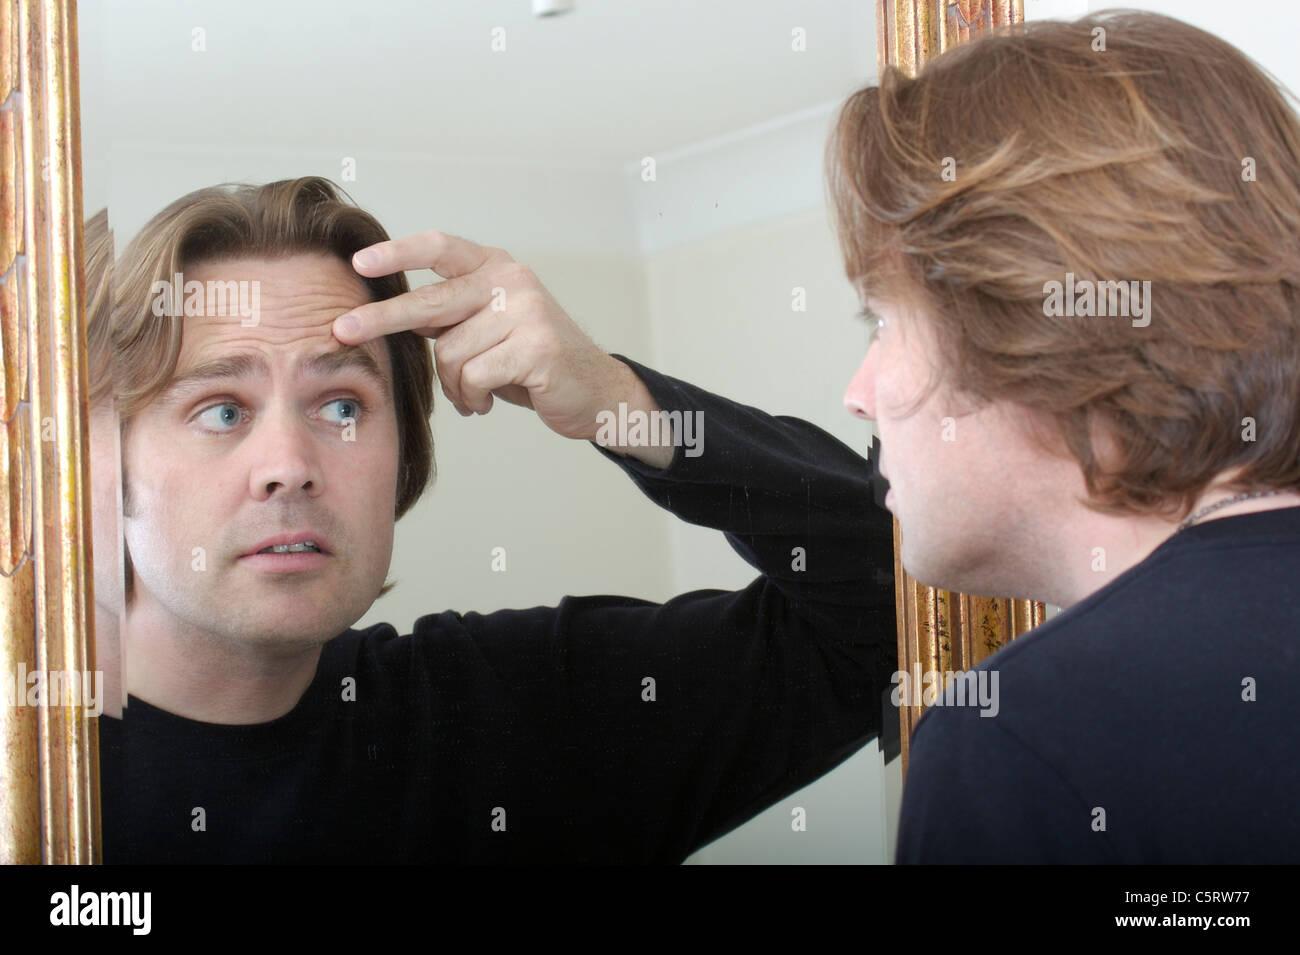 man looking into mirror - Stock Image